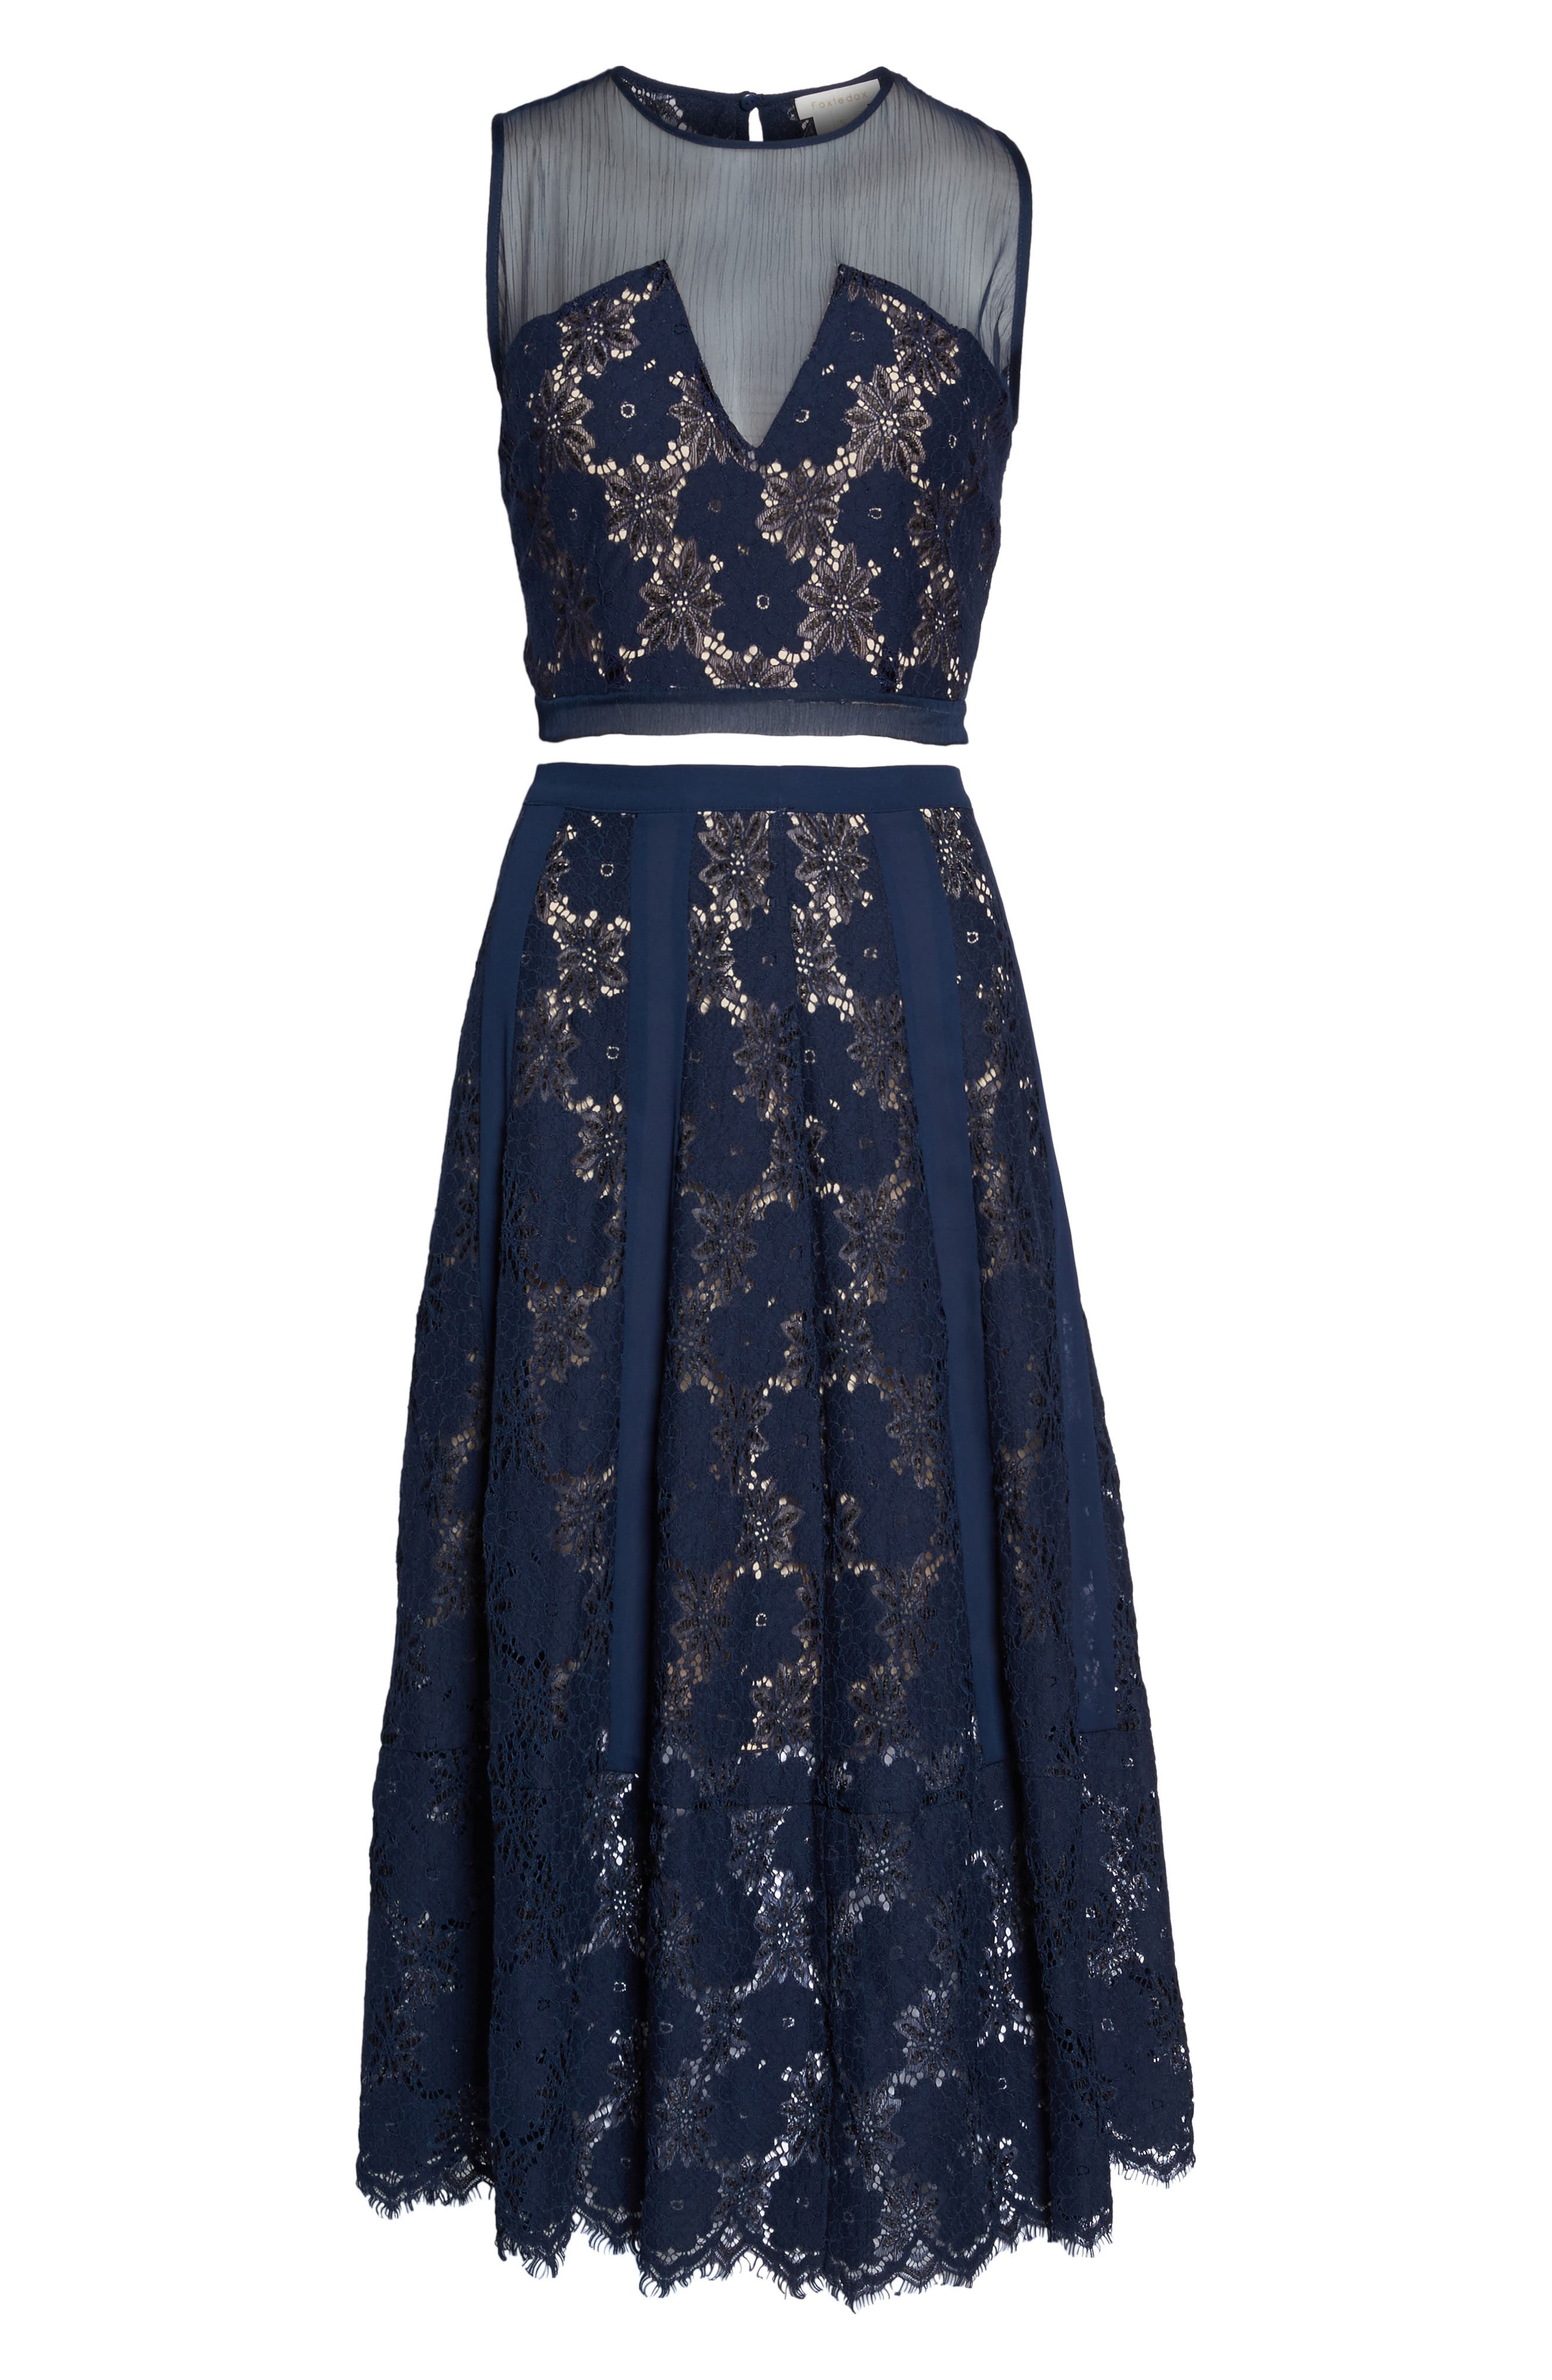 Atiqah Two-Piece Dress,                             Alternate thumbnail 6, color,                             414